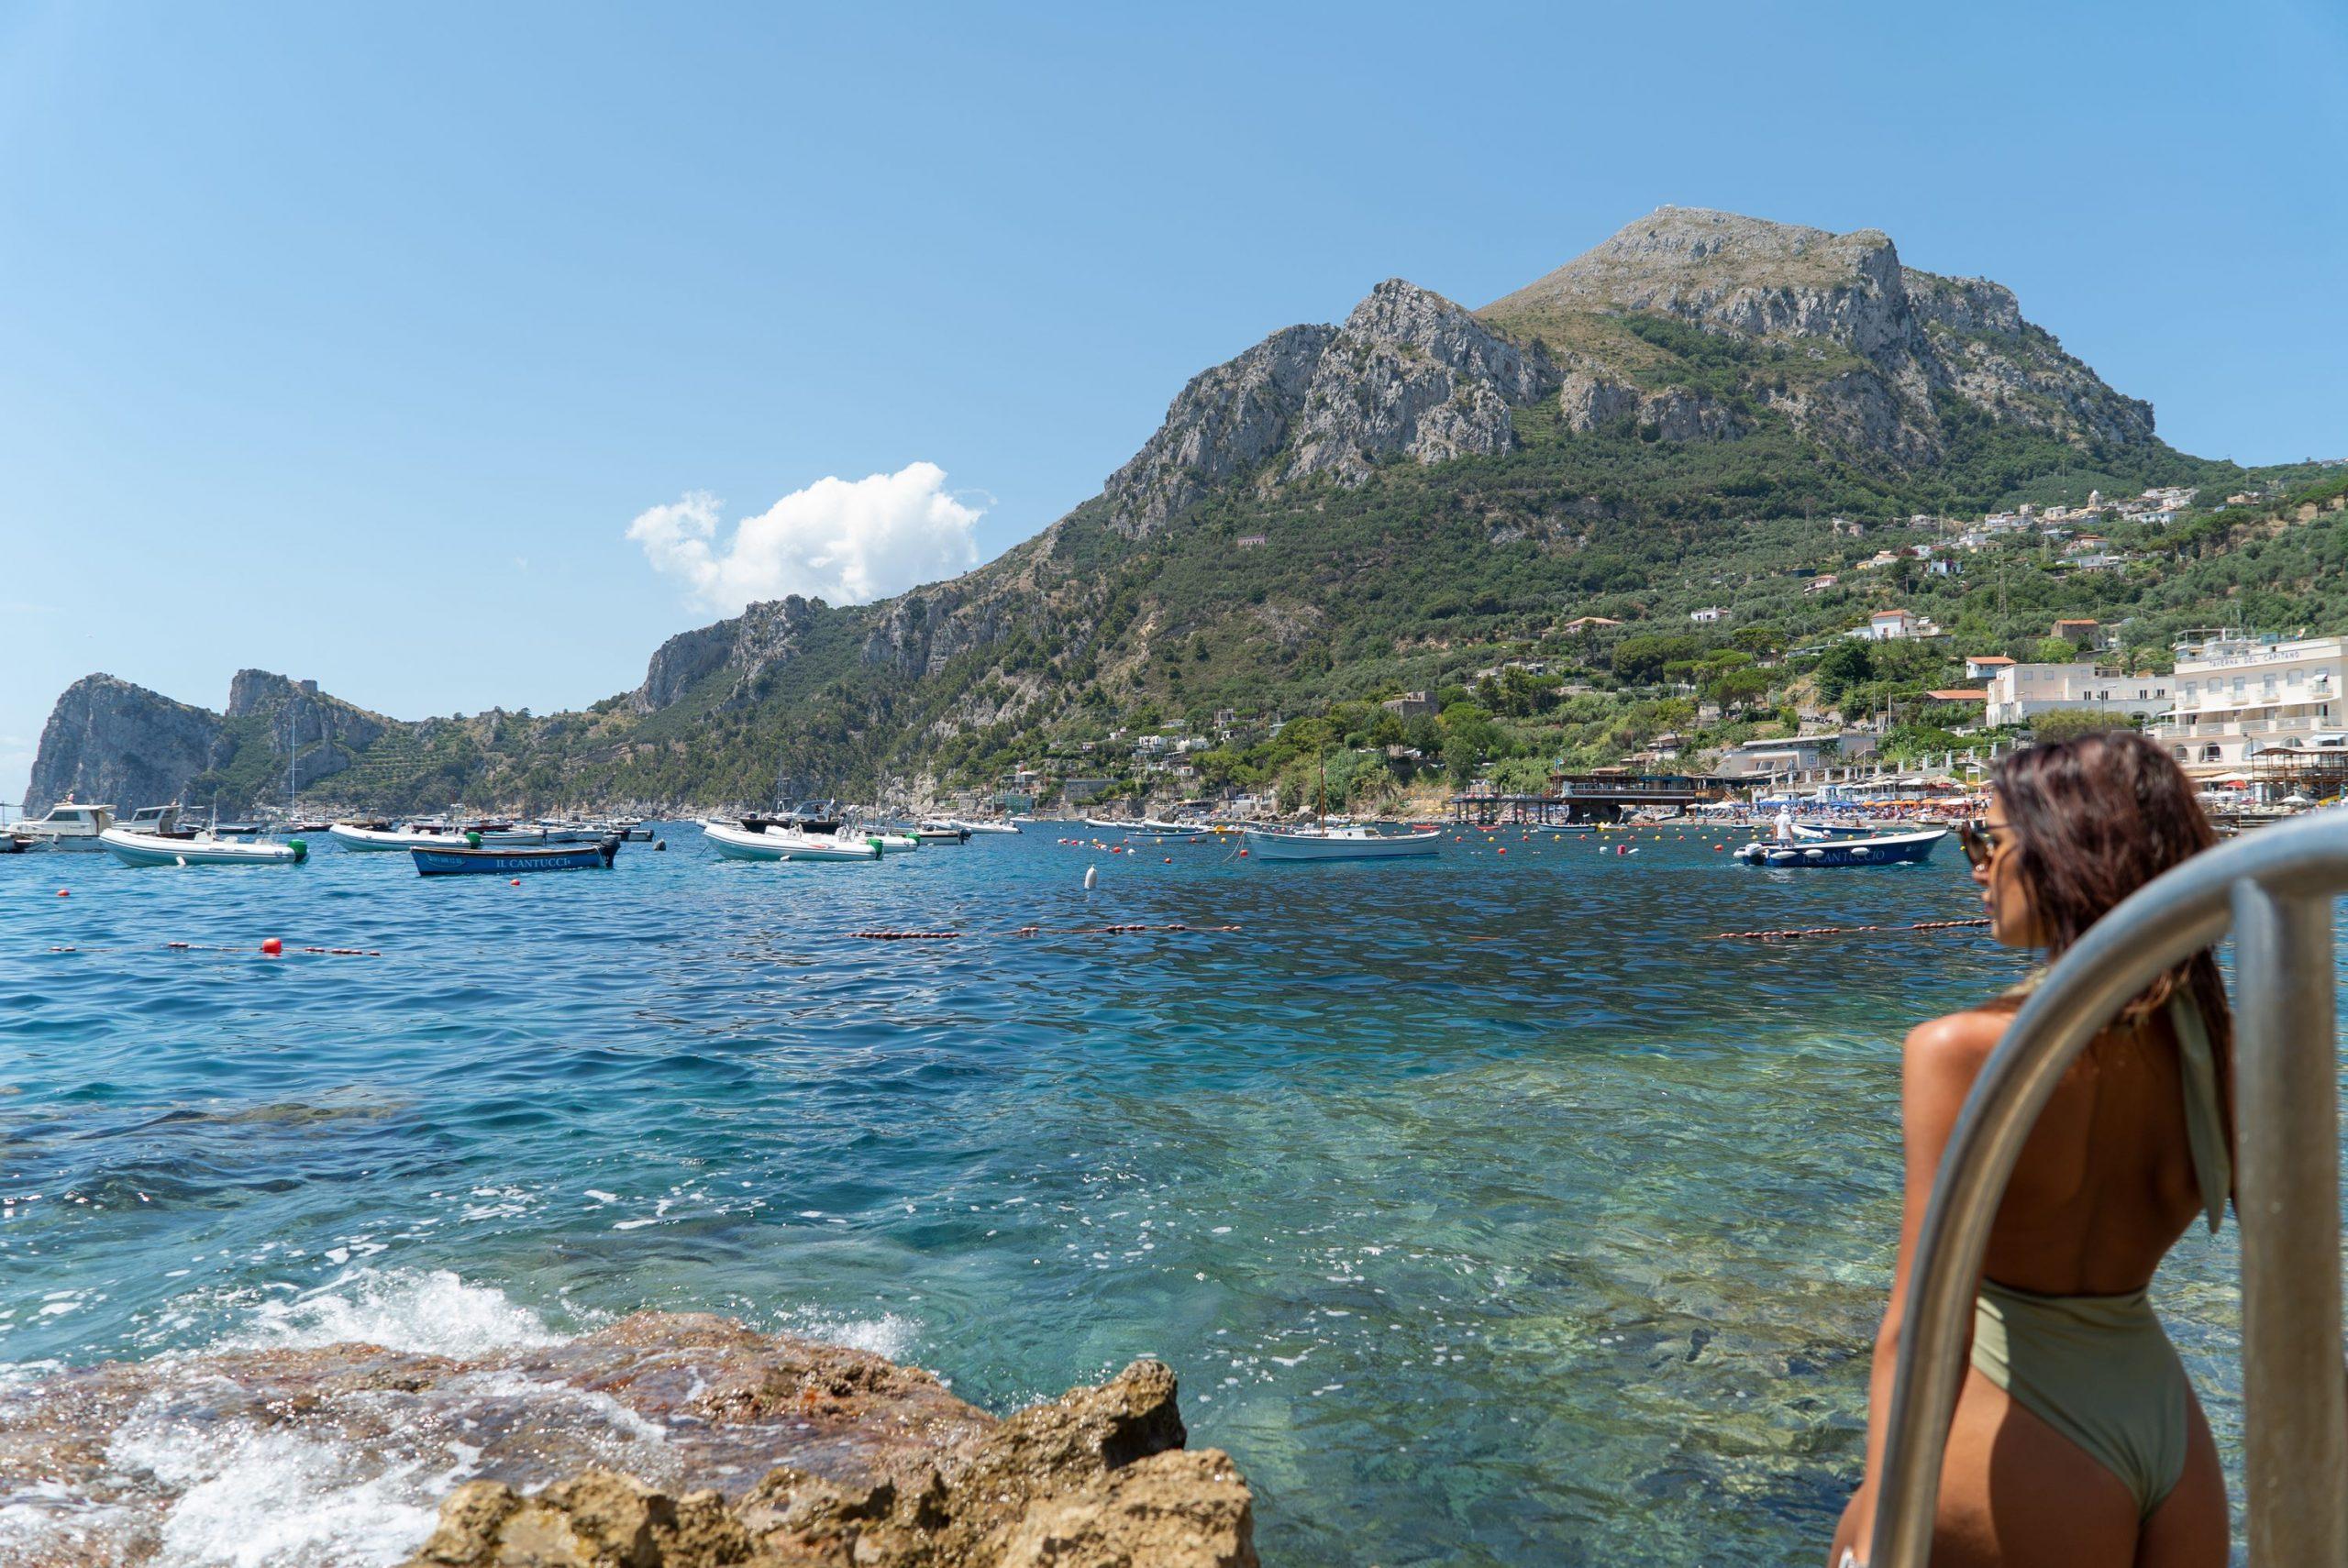 Villa Sorrento Coast with swimming pool and beach